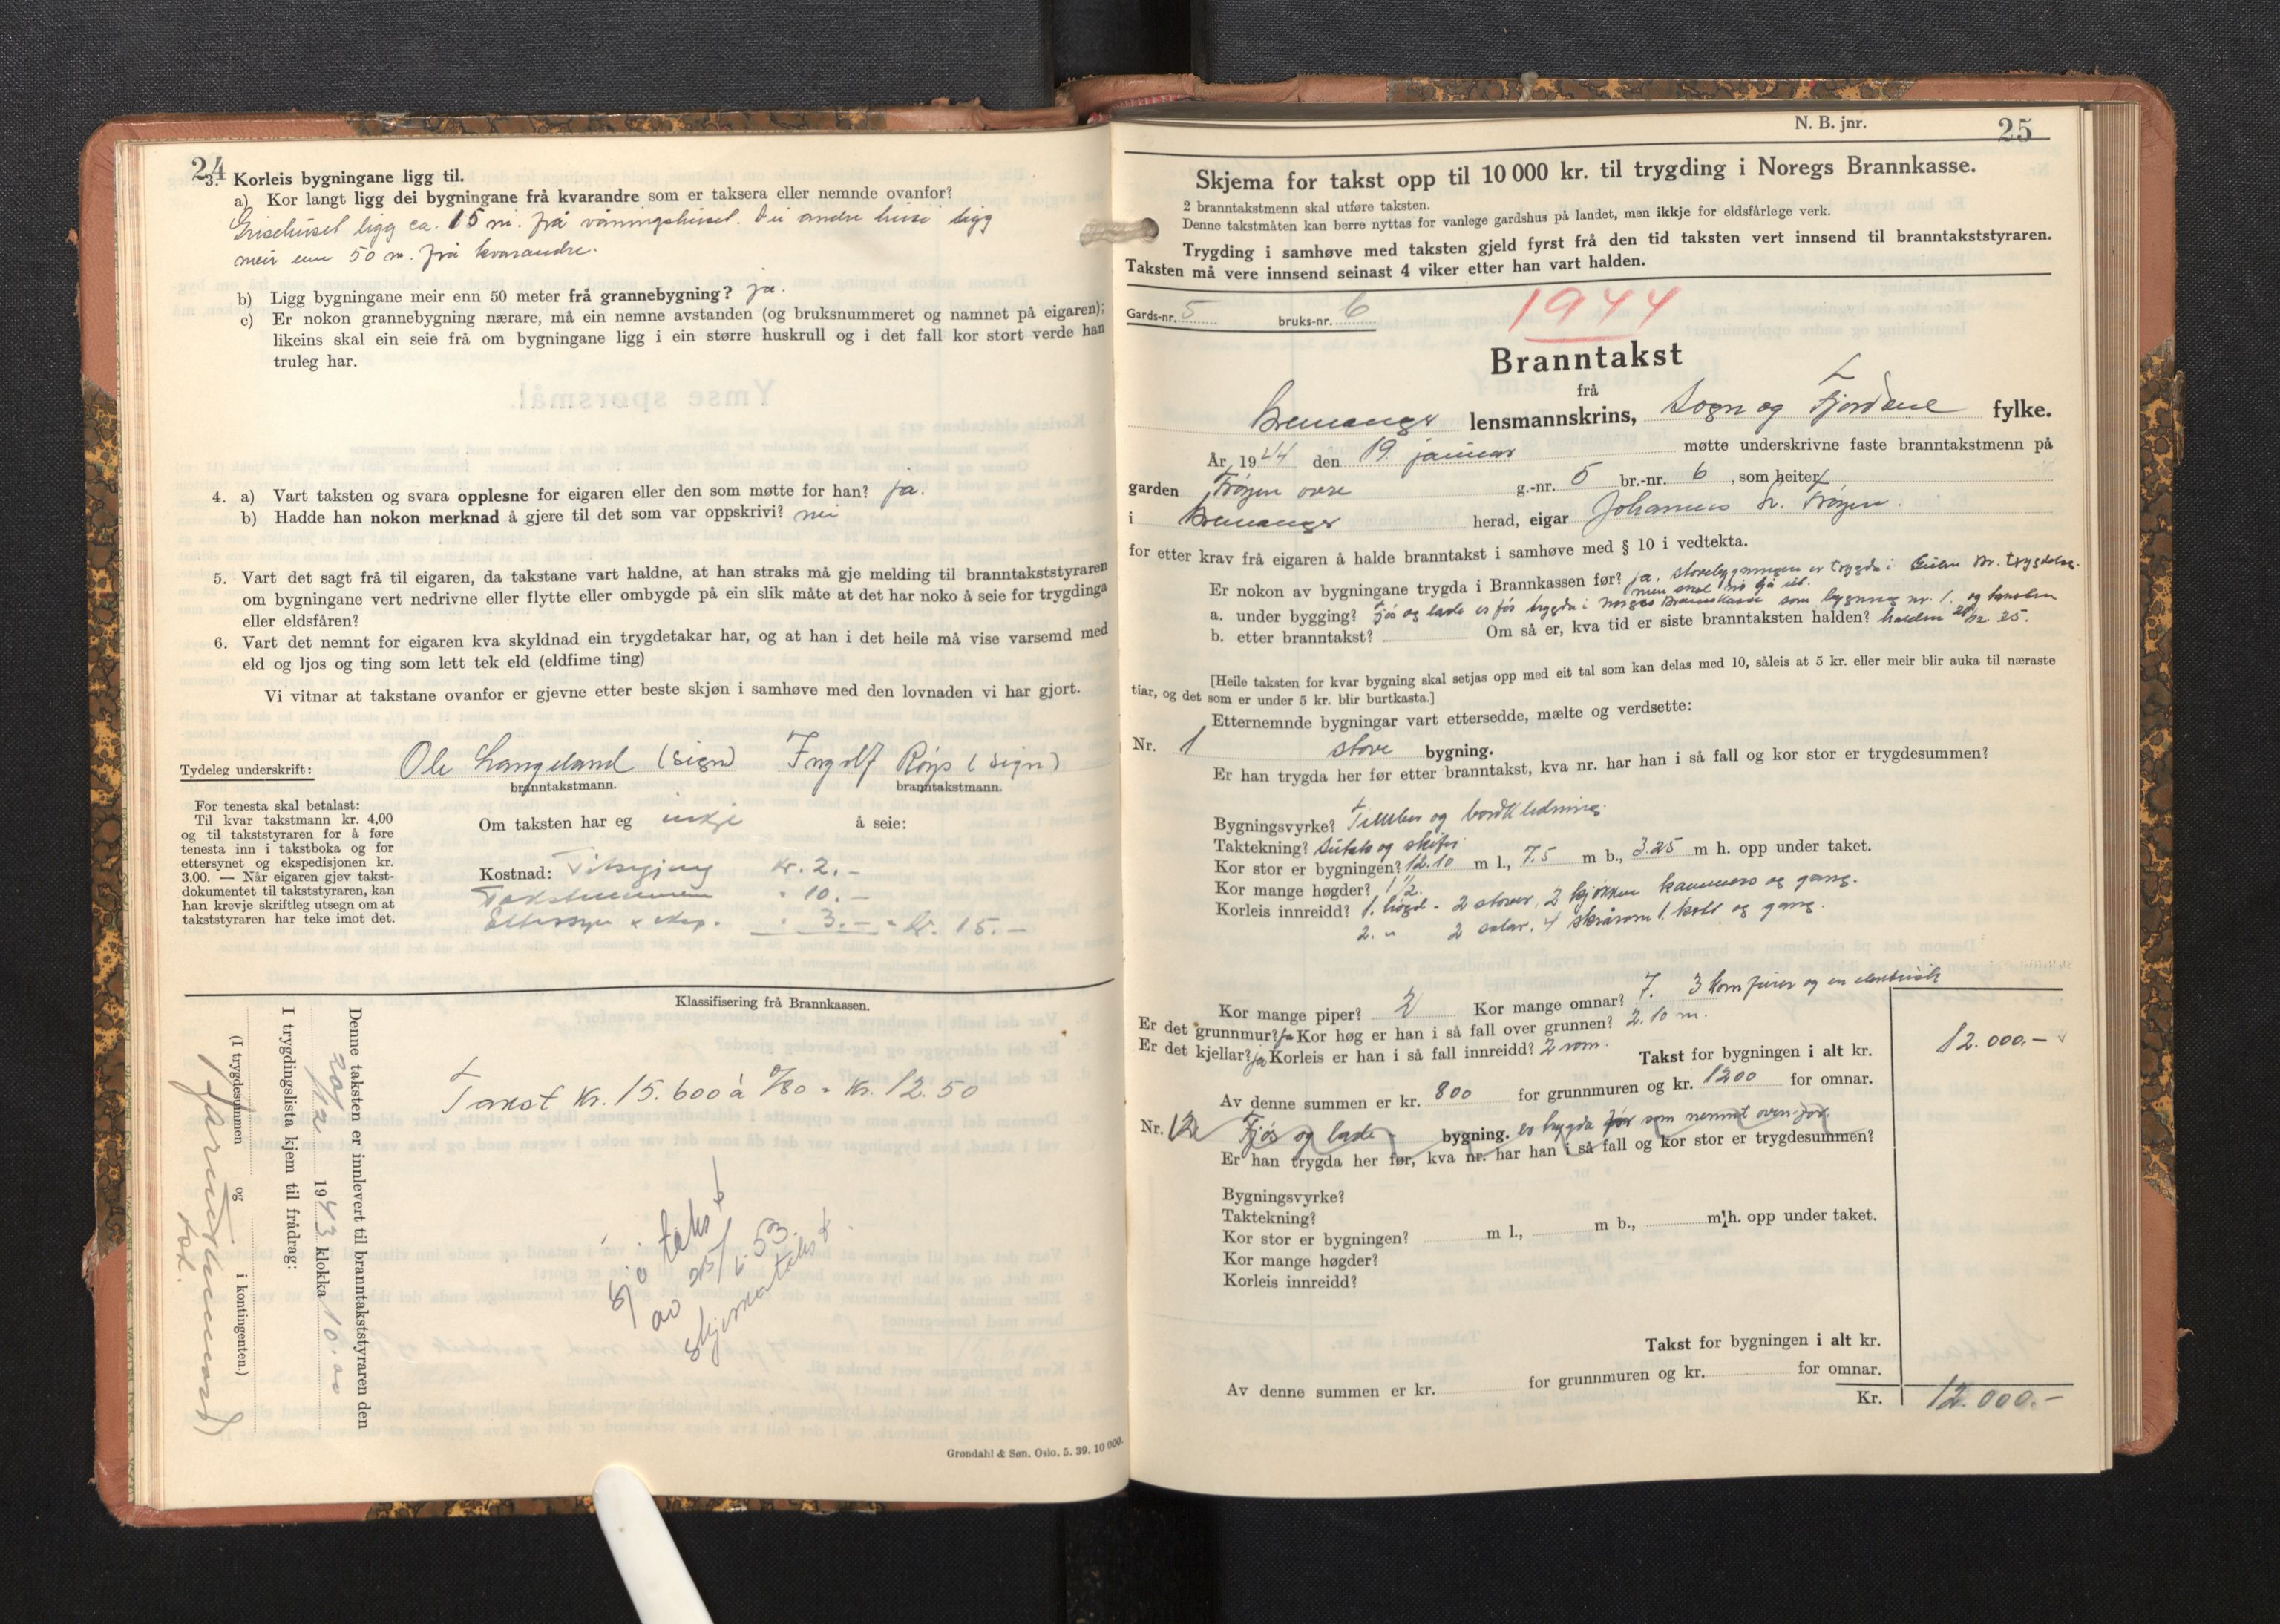 SAB, Lensmannen i Bremanger, 0012/L0009: Branntakstprotokoll, skjematakst, 1943-1950, p. 24-25